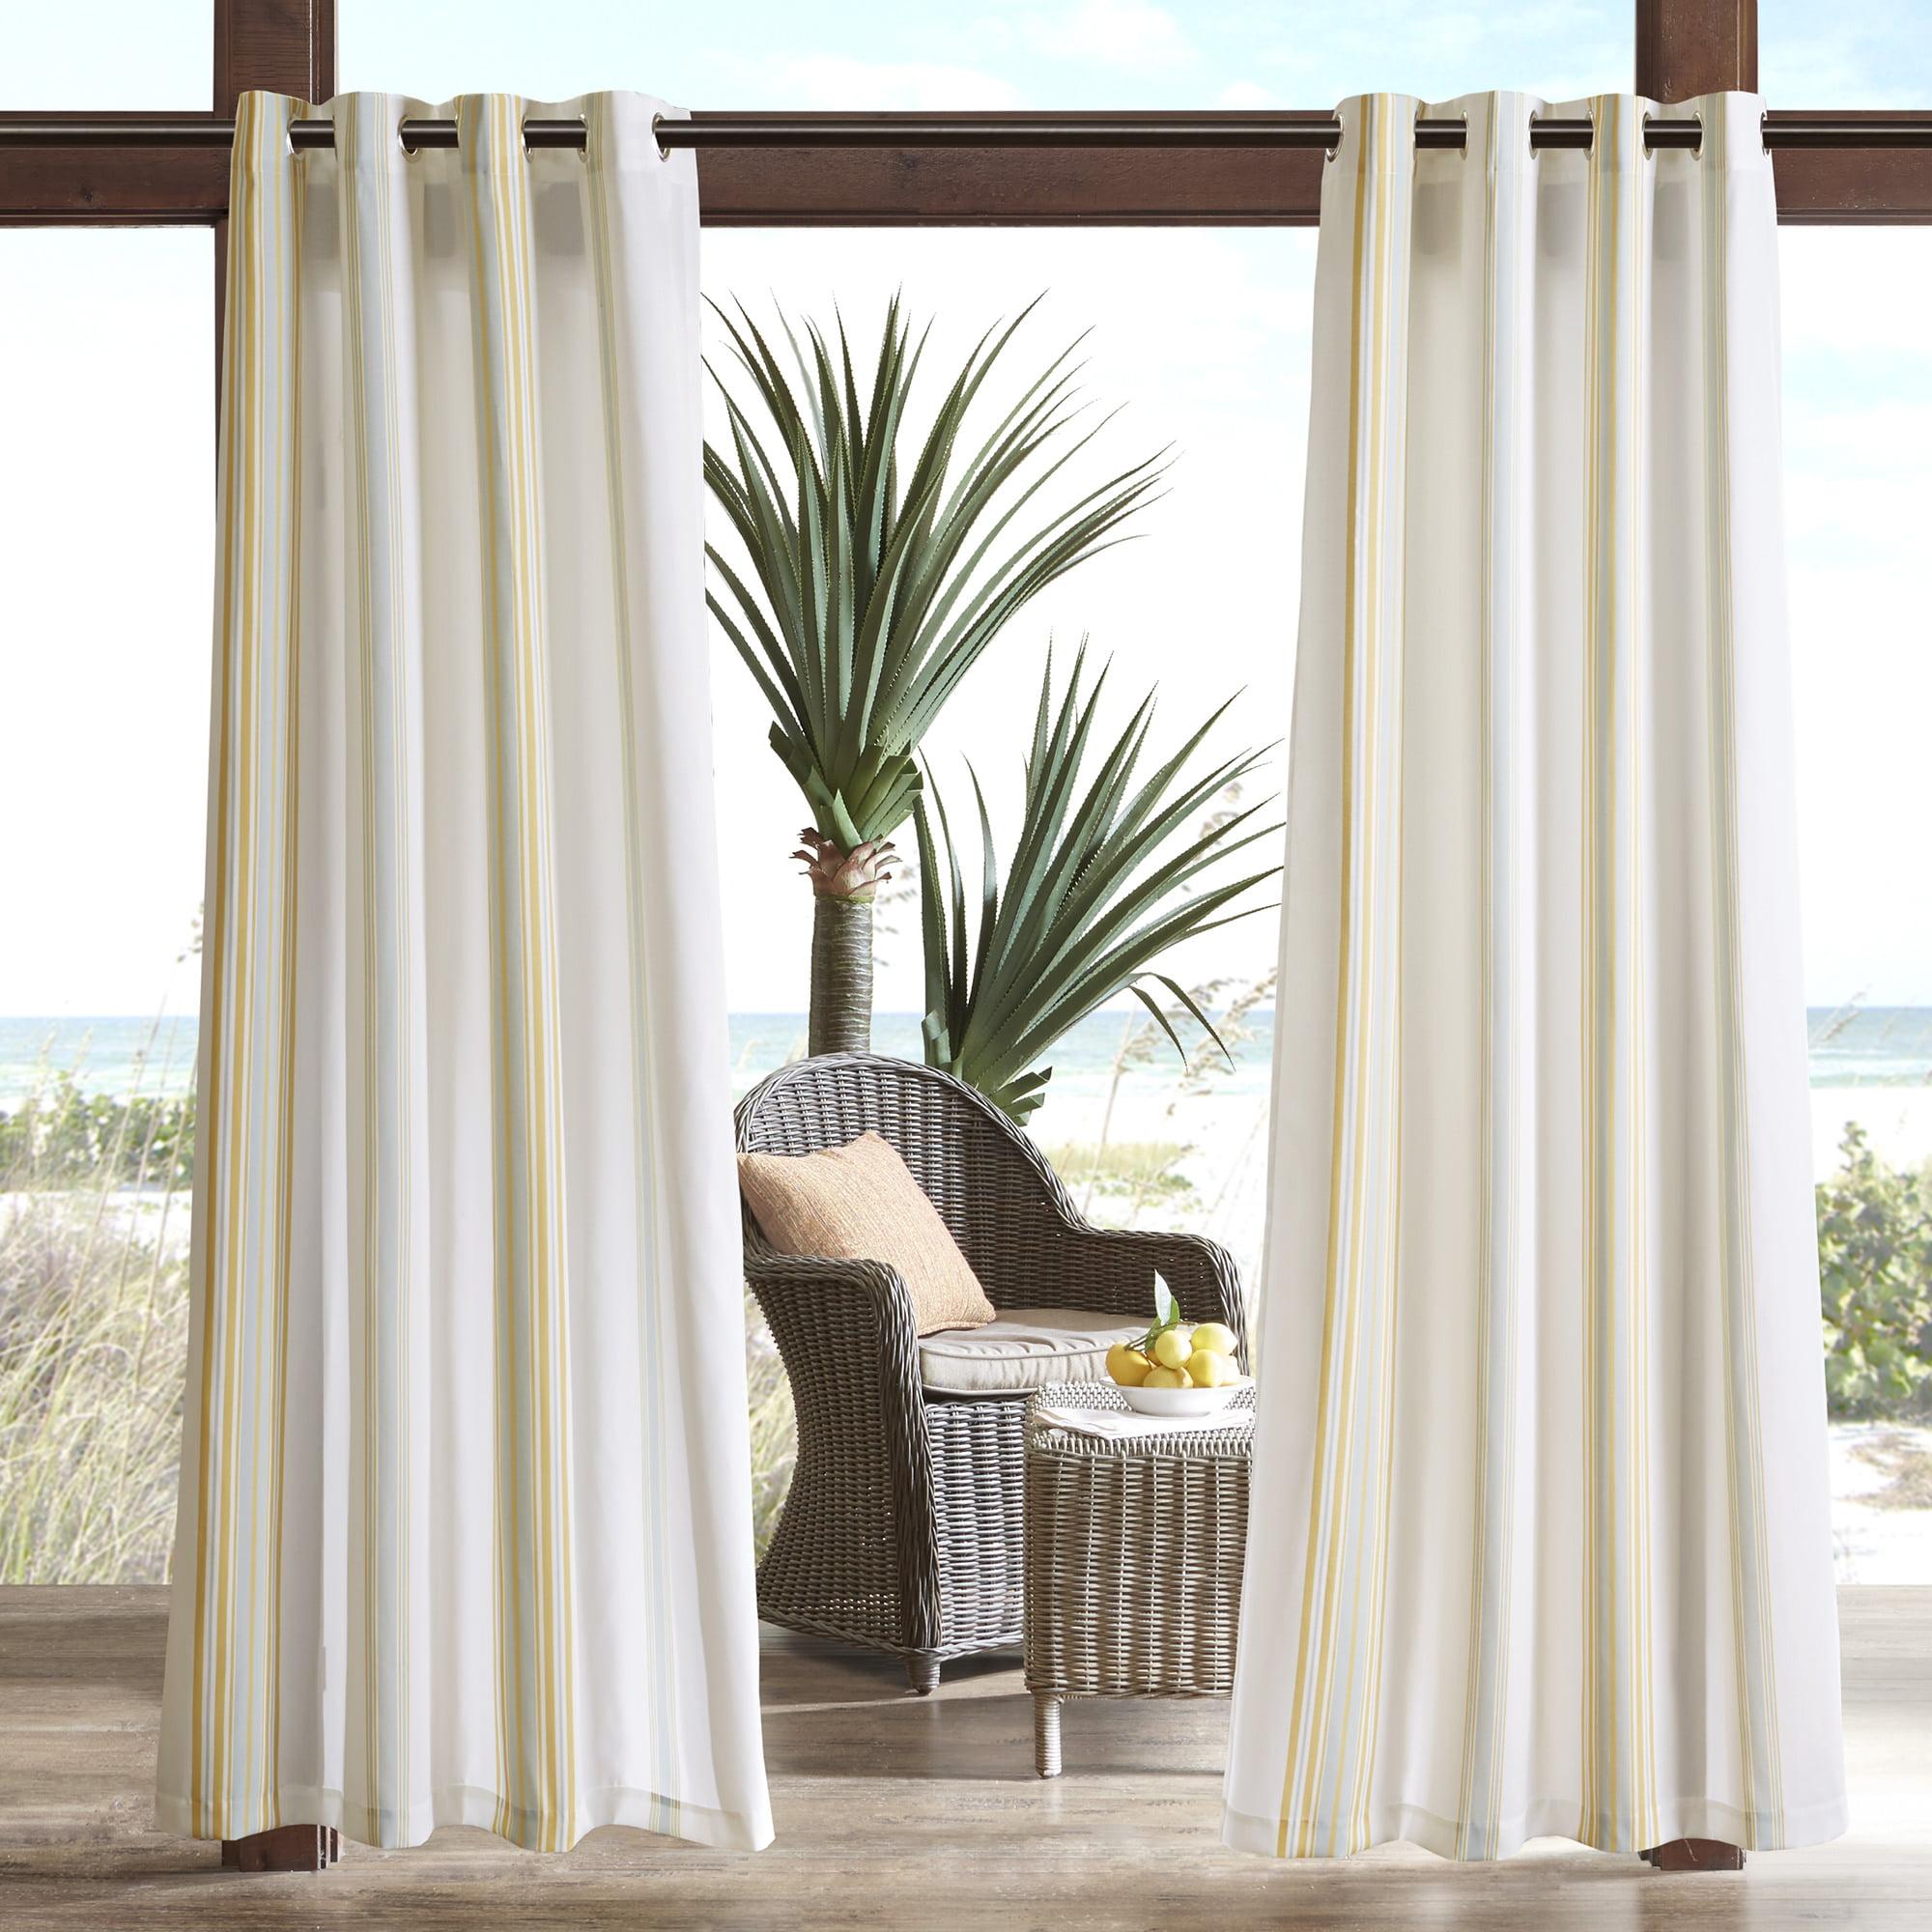 Home Essence Ventura Printed Stripe 3M Scotchgard Outdoor Panel